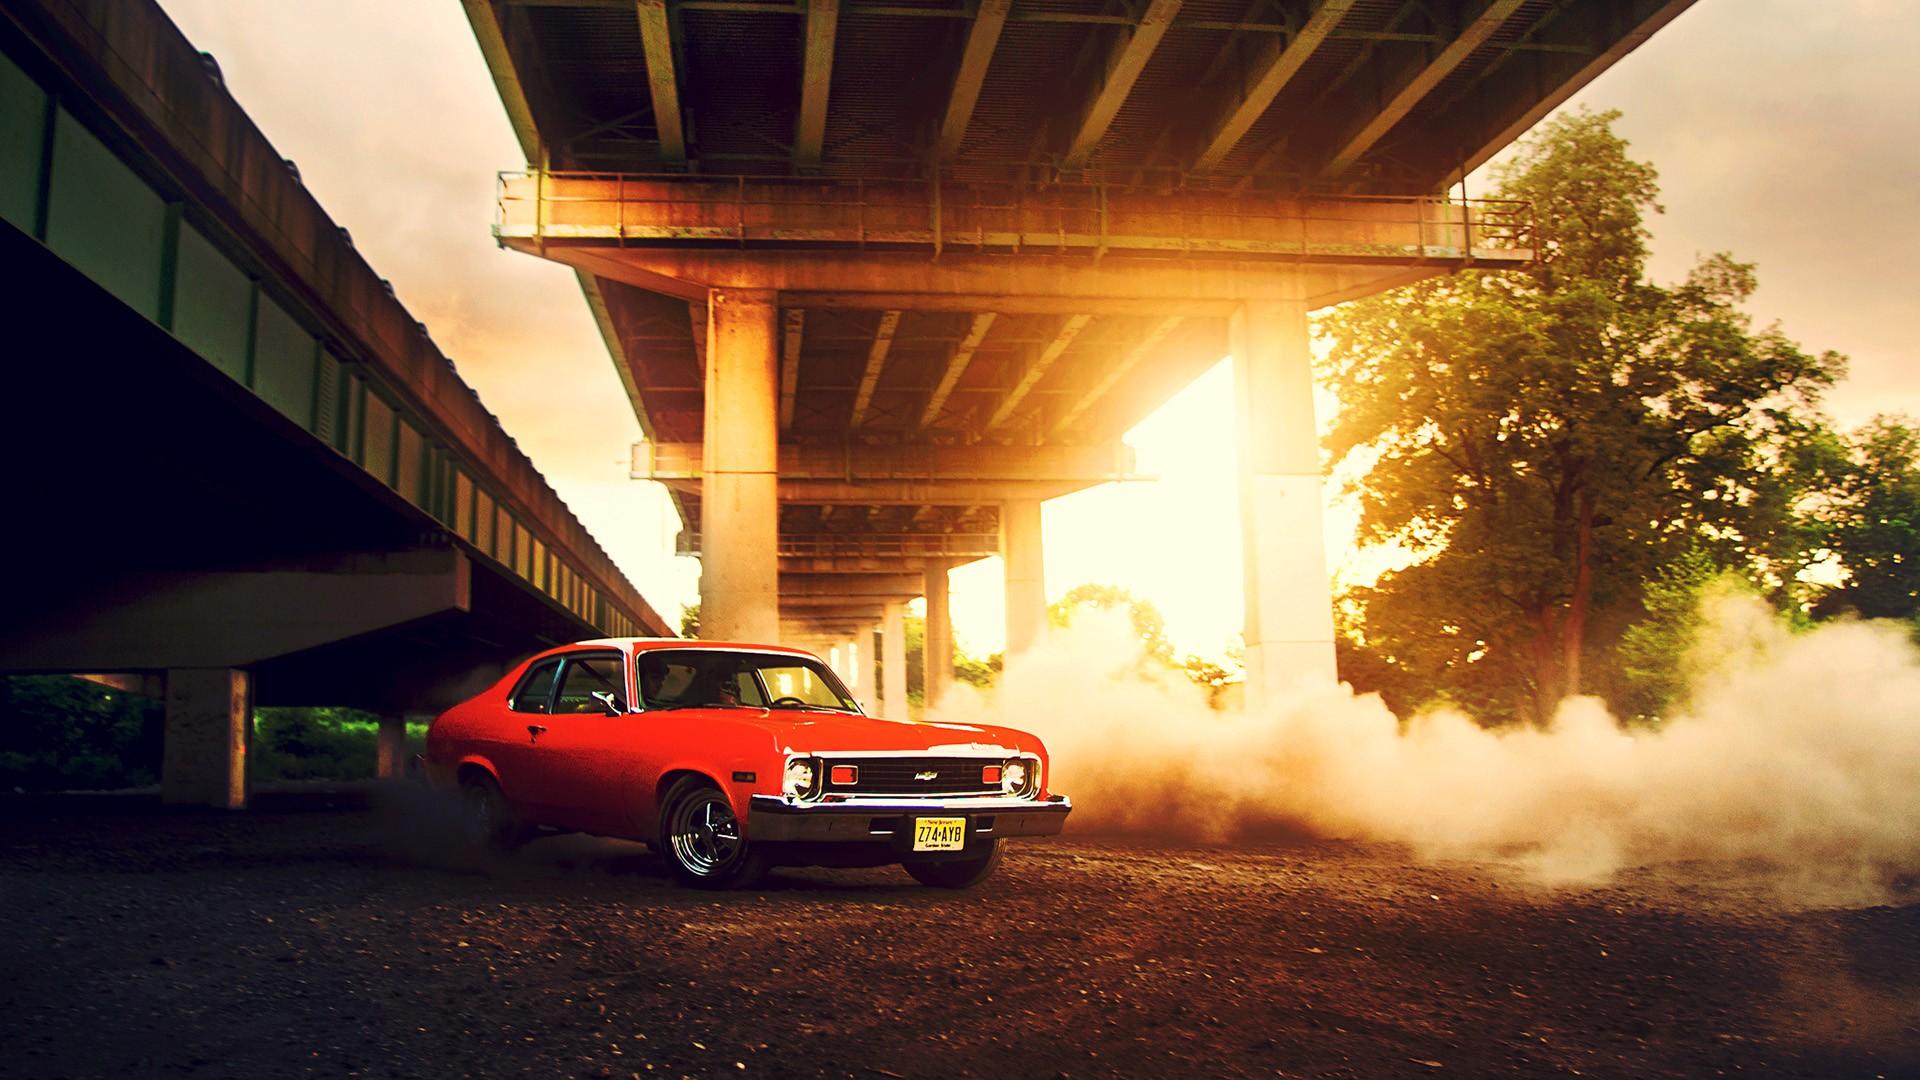 Chevrolet Corvette Stingray C7 Cars 4k Wallpapers Image Hd